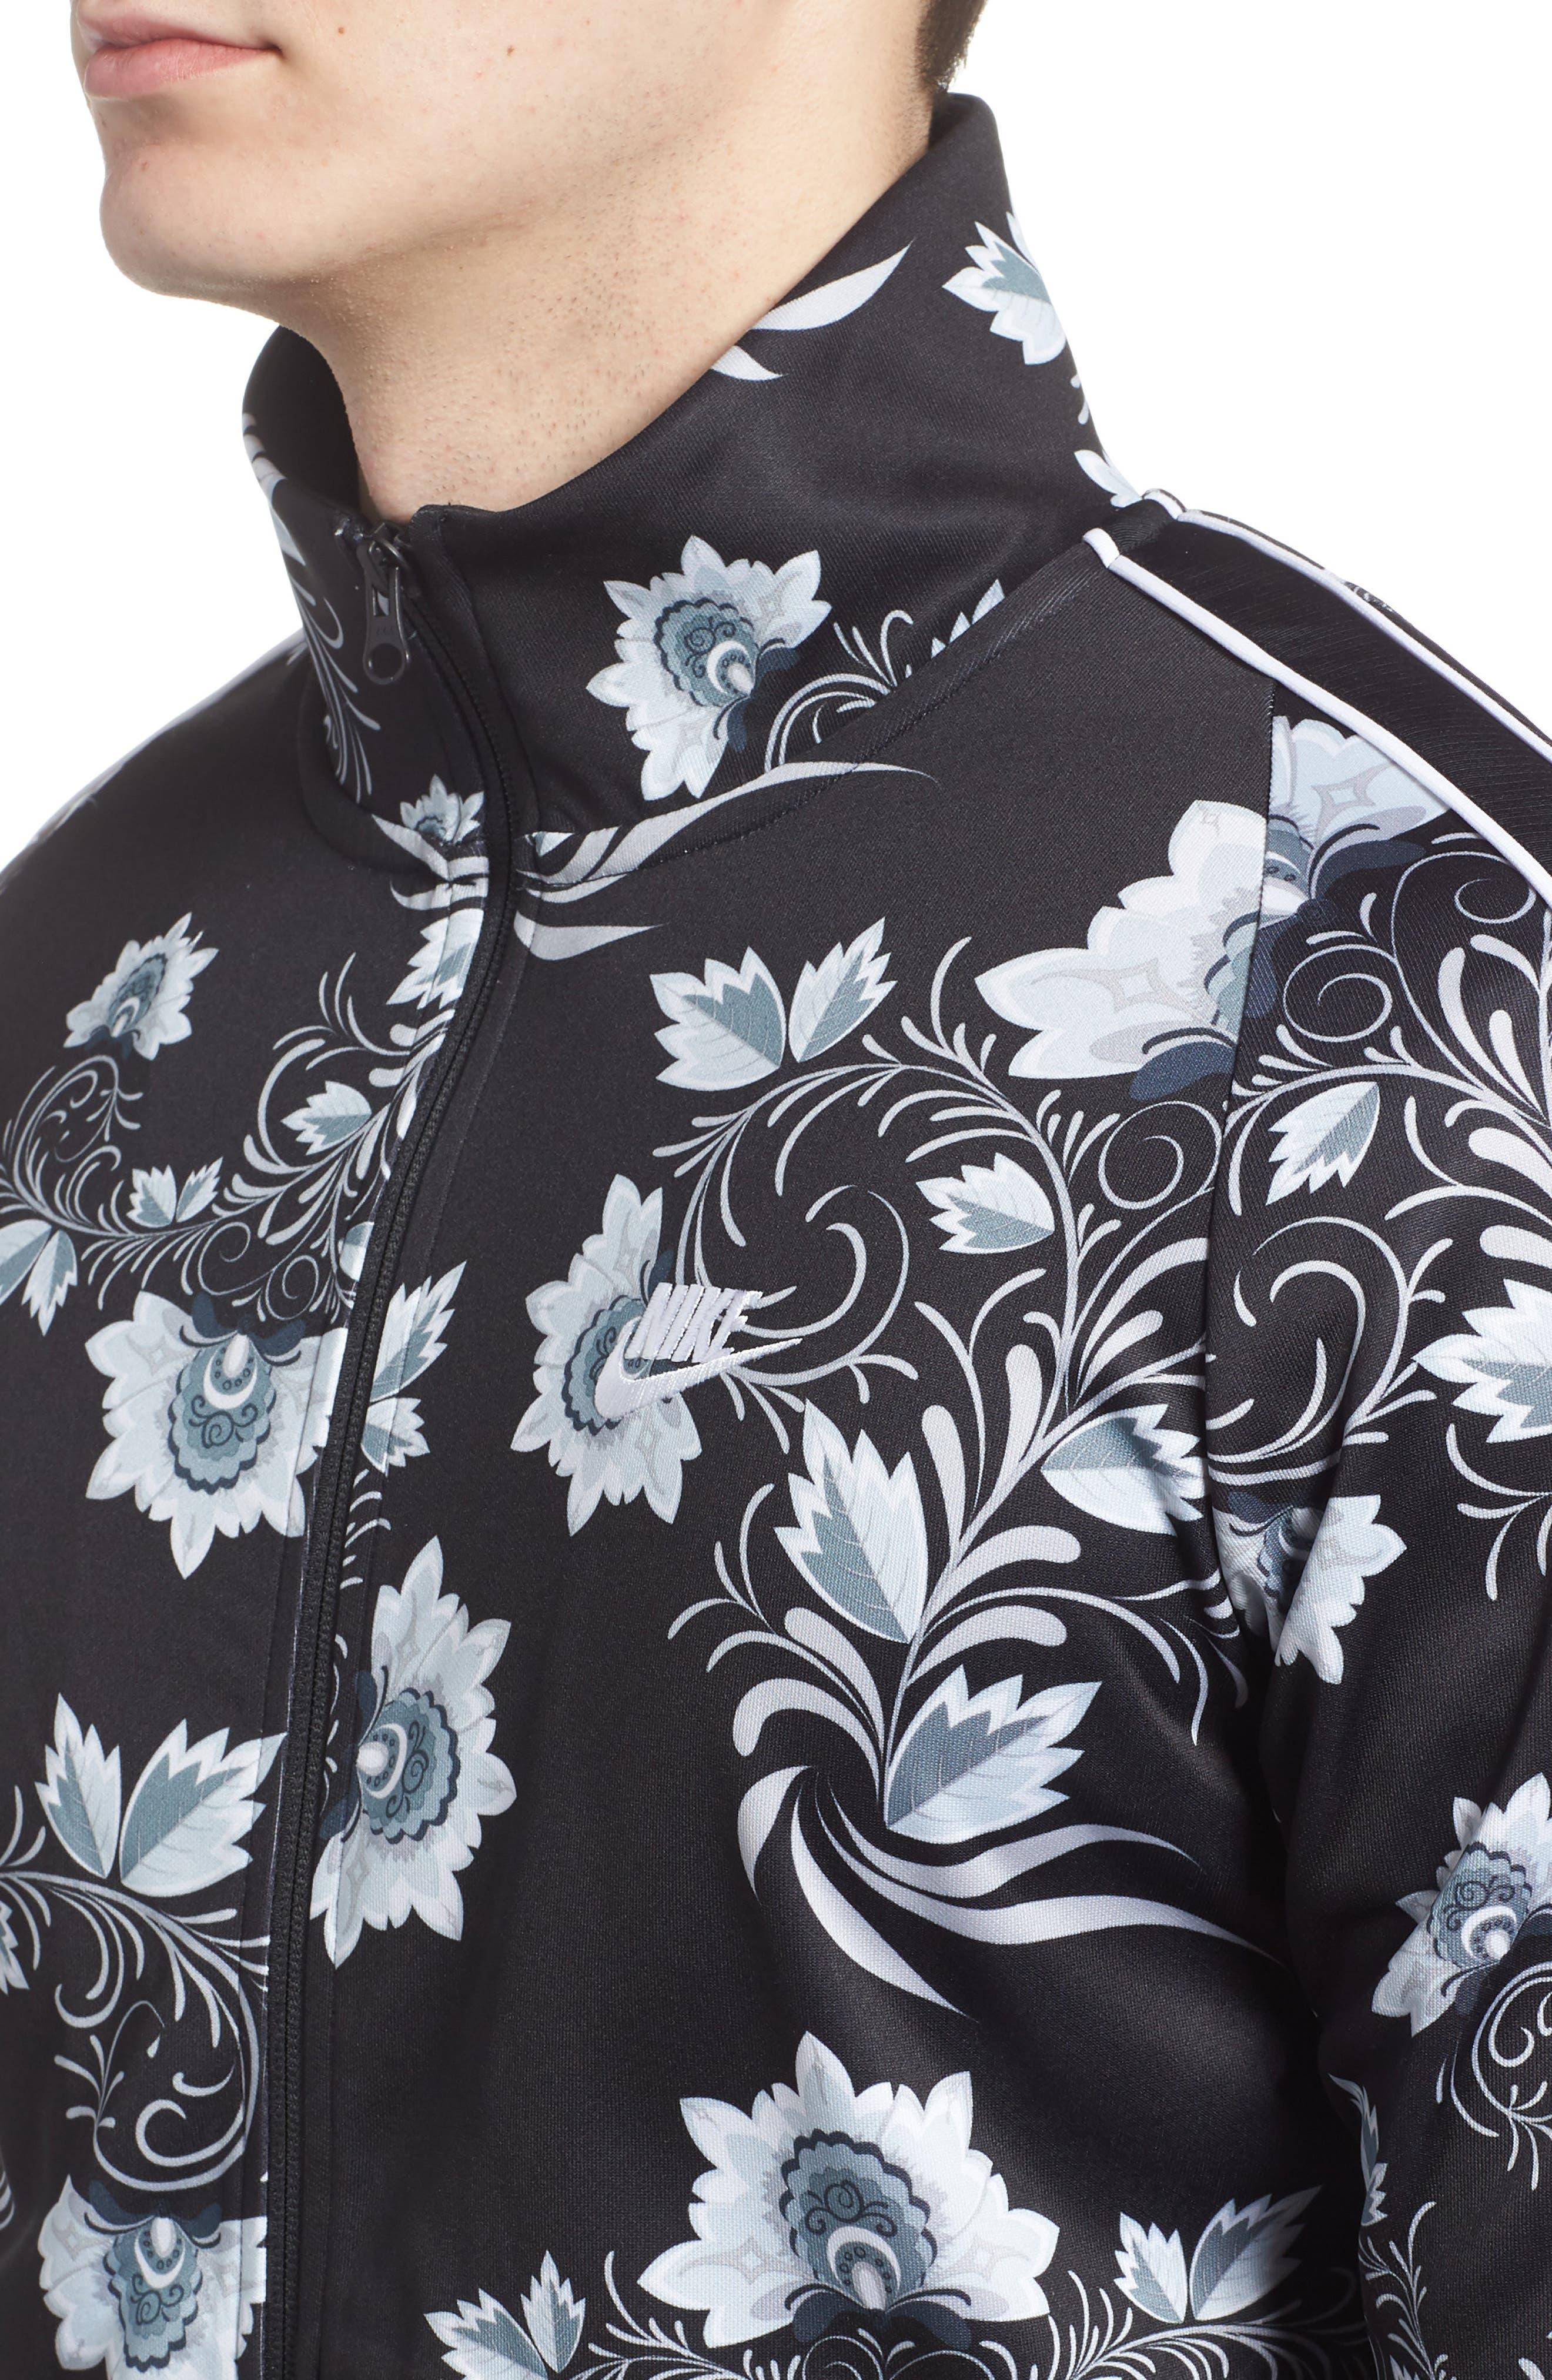 NSW Tribute Jacket,                             Alternate thumbnail 4, color,                             White/ Black/ White